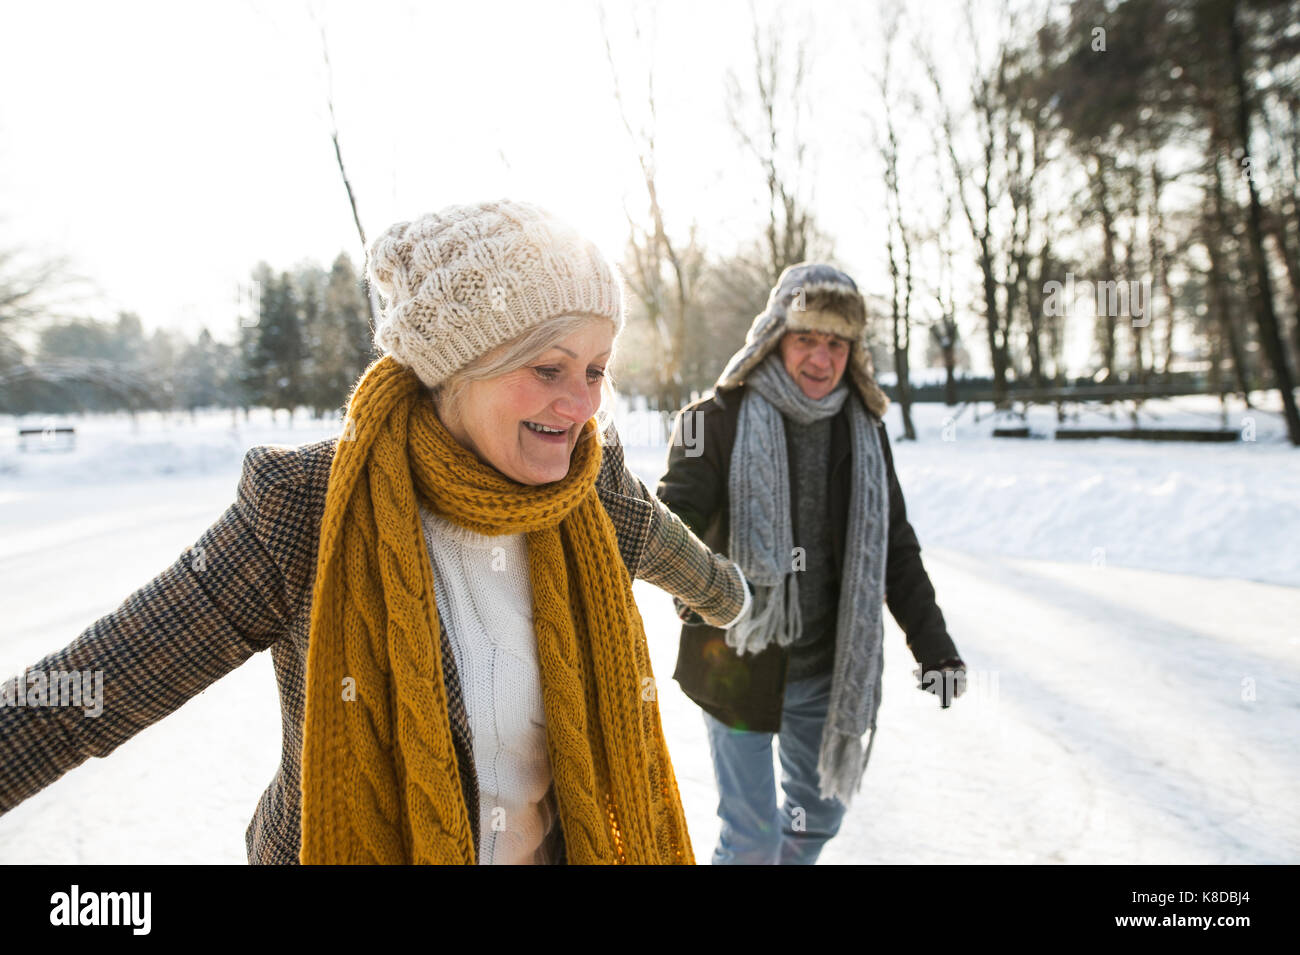 Älteres Paar im sonnigen Winter Natur Eiskunstlauf. Stockbild